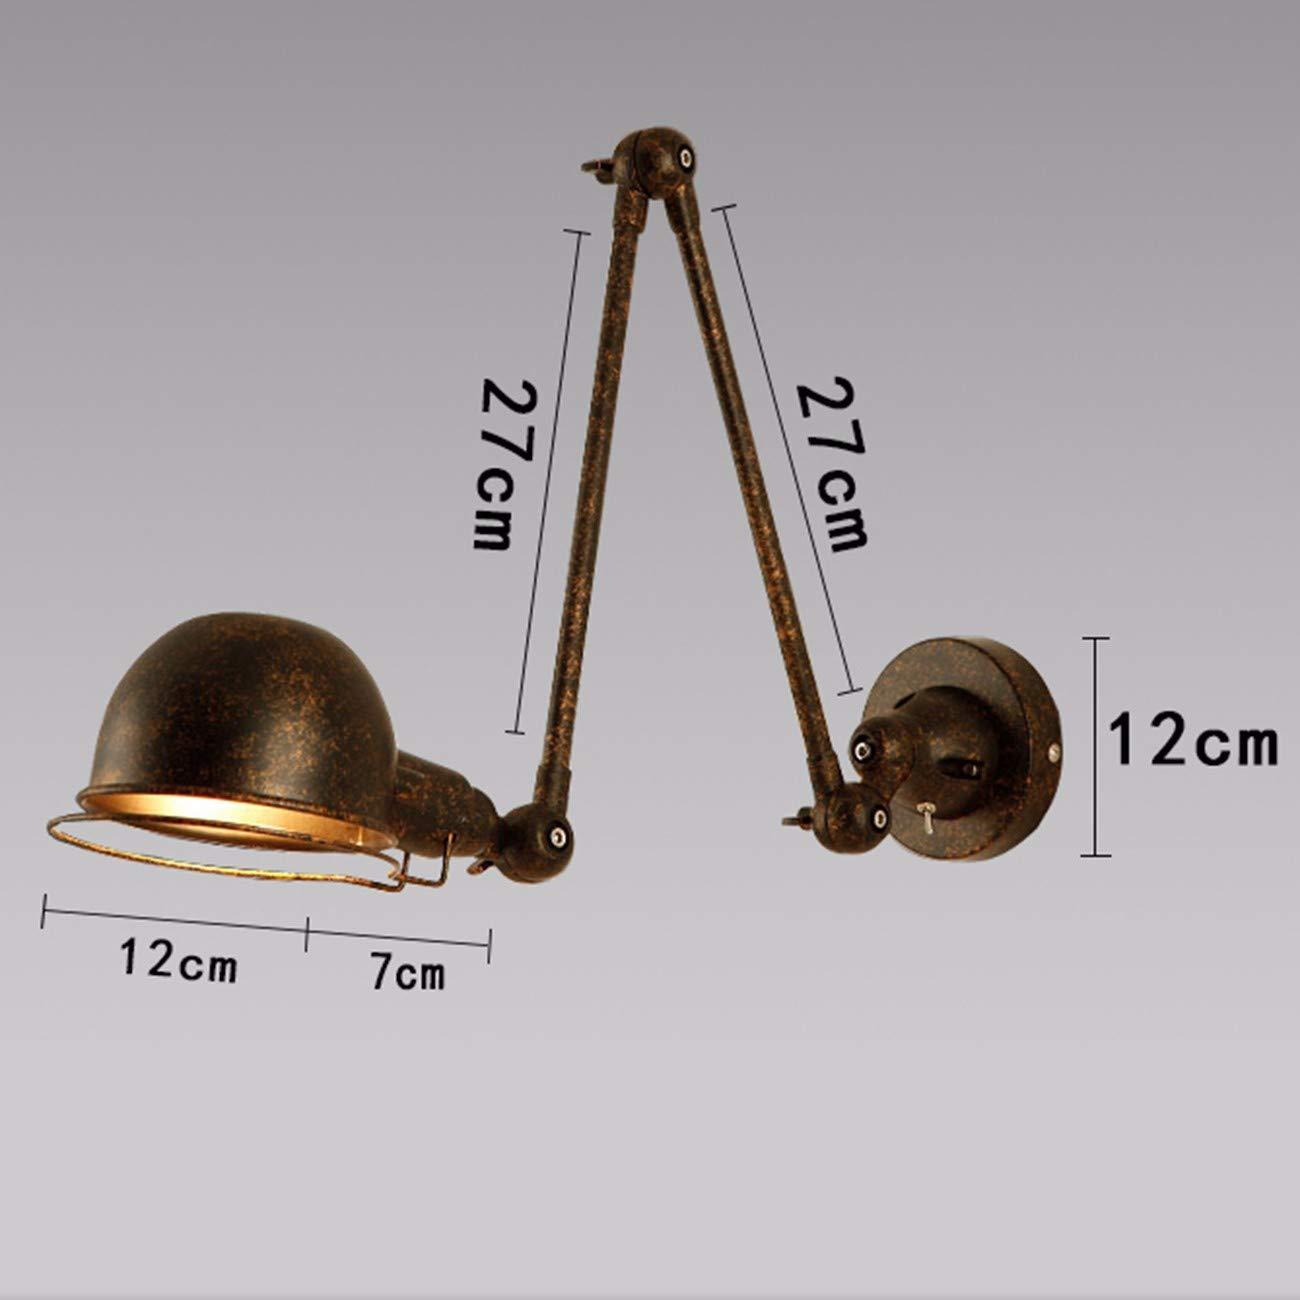 Wandleuchte Wall Lamp Individualität Originalität, Bett - Teleskop Dekorative Augenschutz Lampe,C